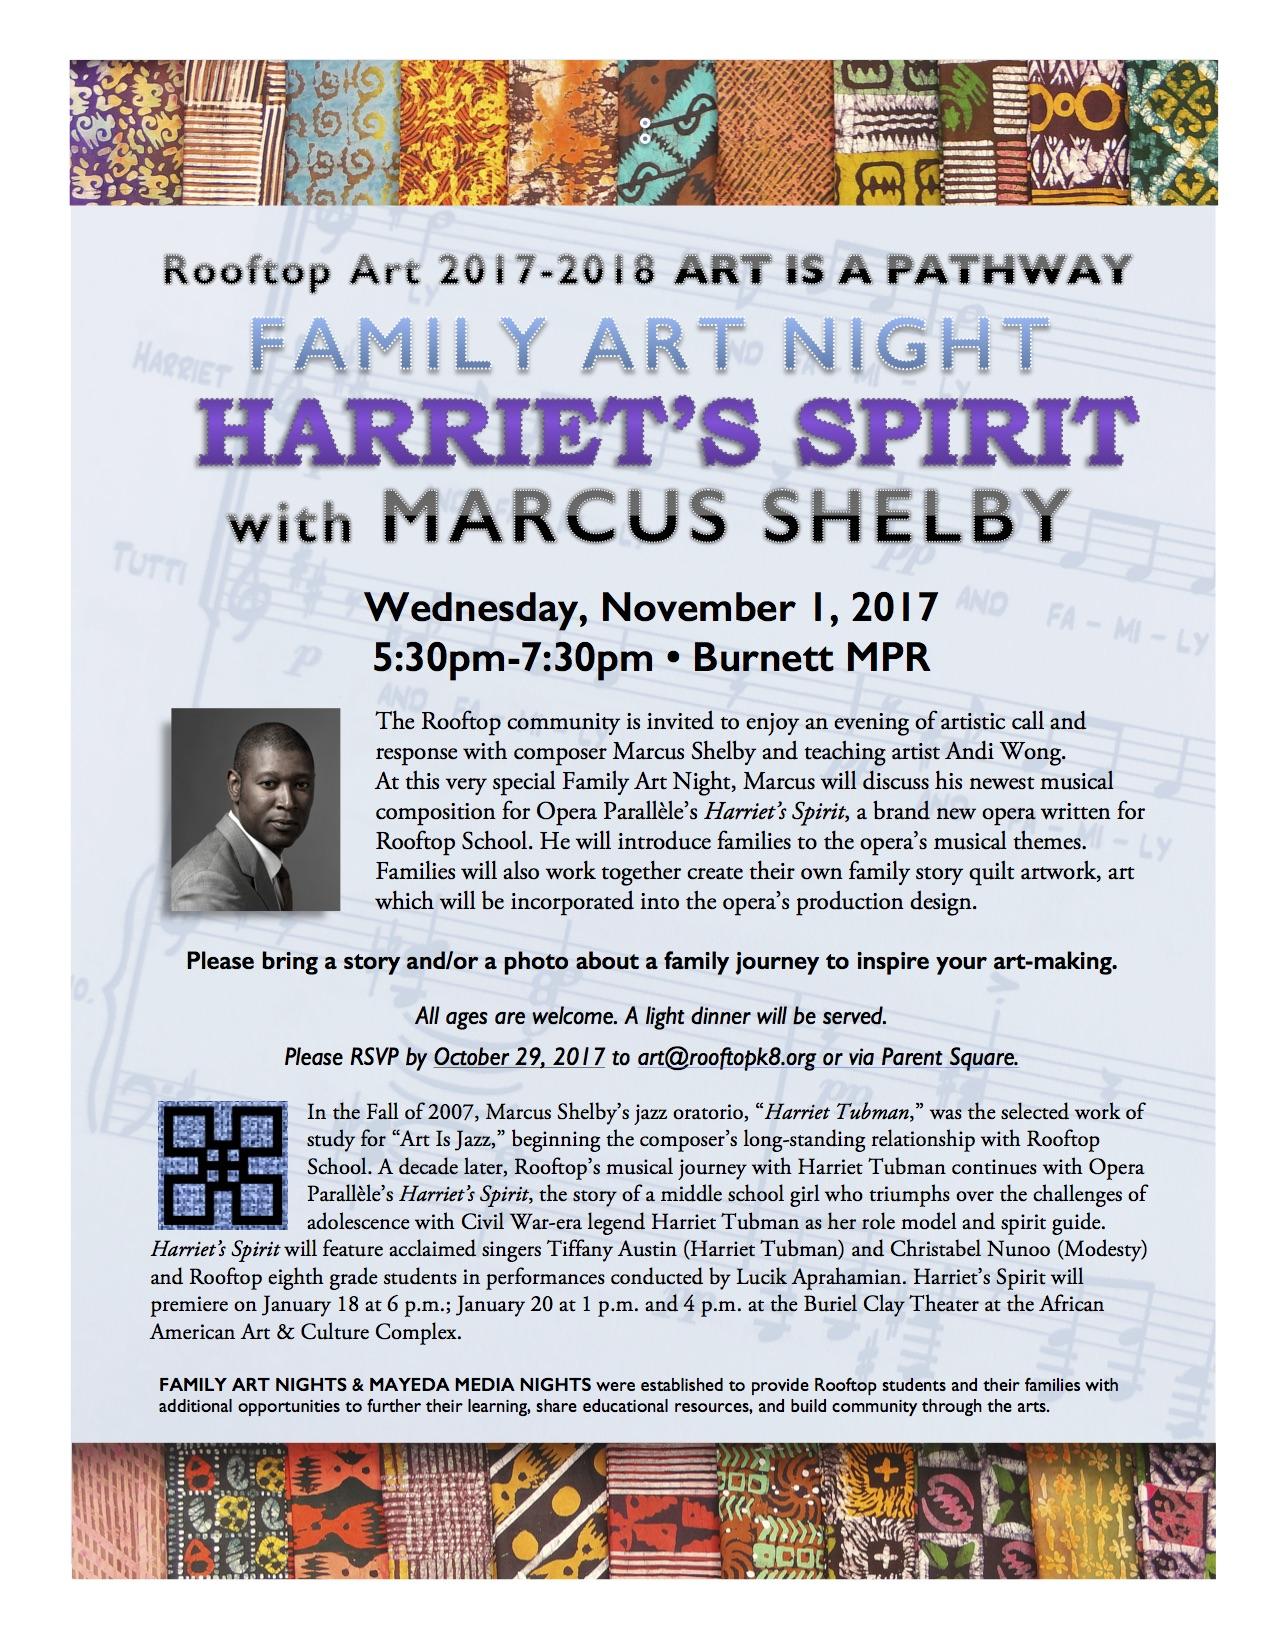 FAN 2017 Harriet's Spirit with Marcus Shelby,jpg